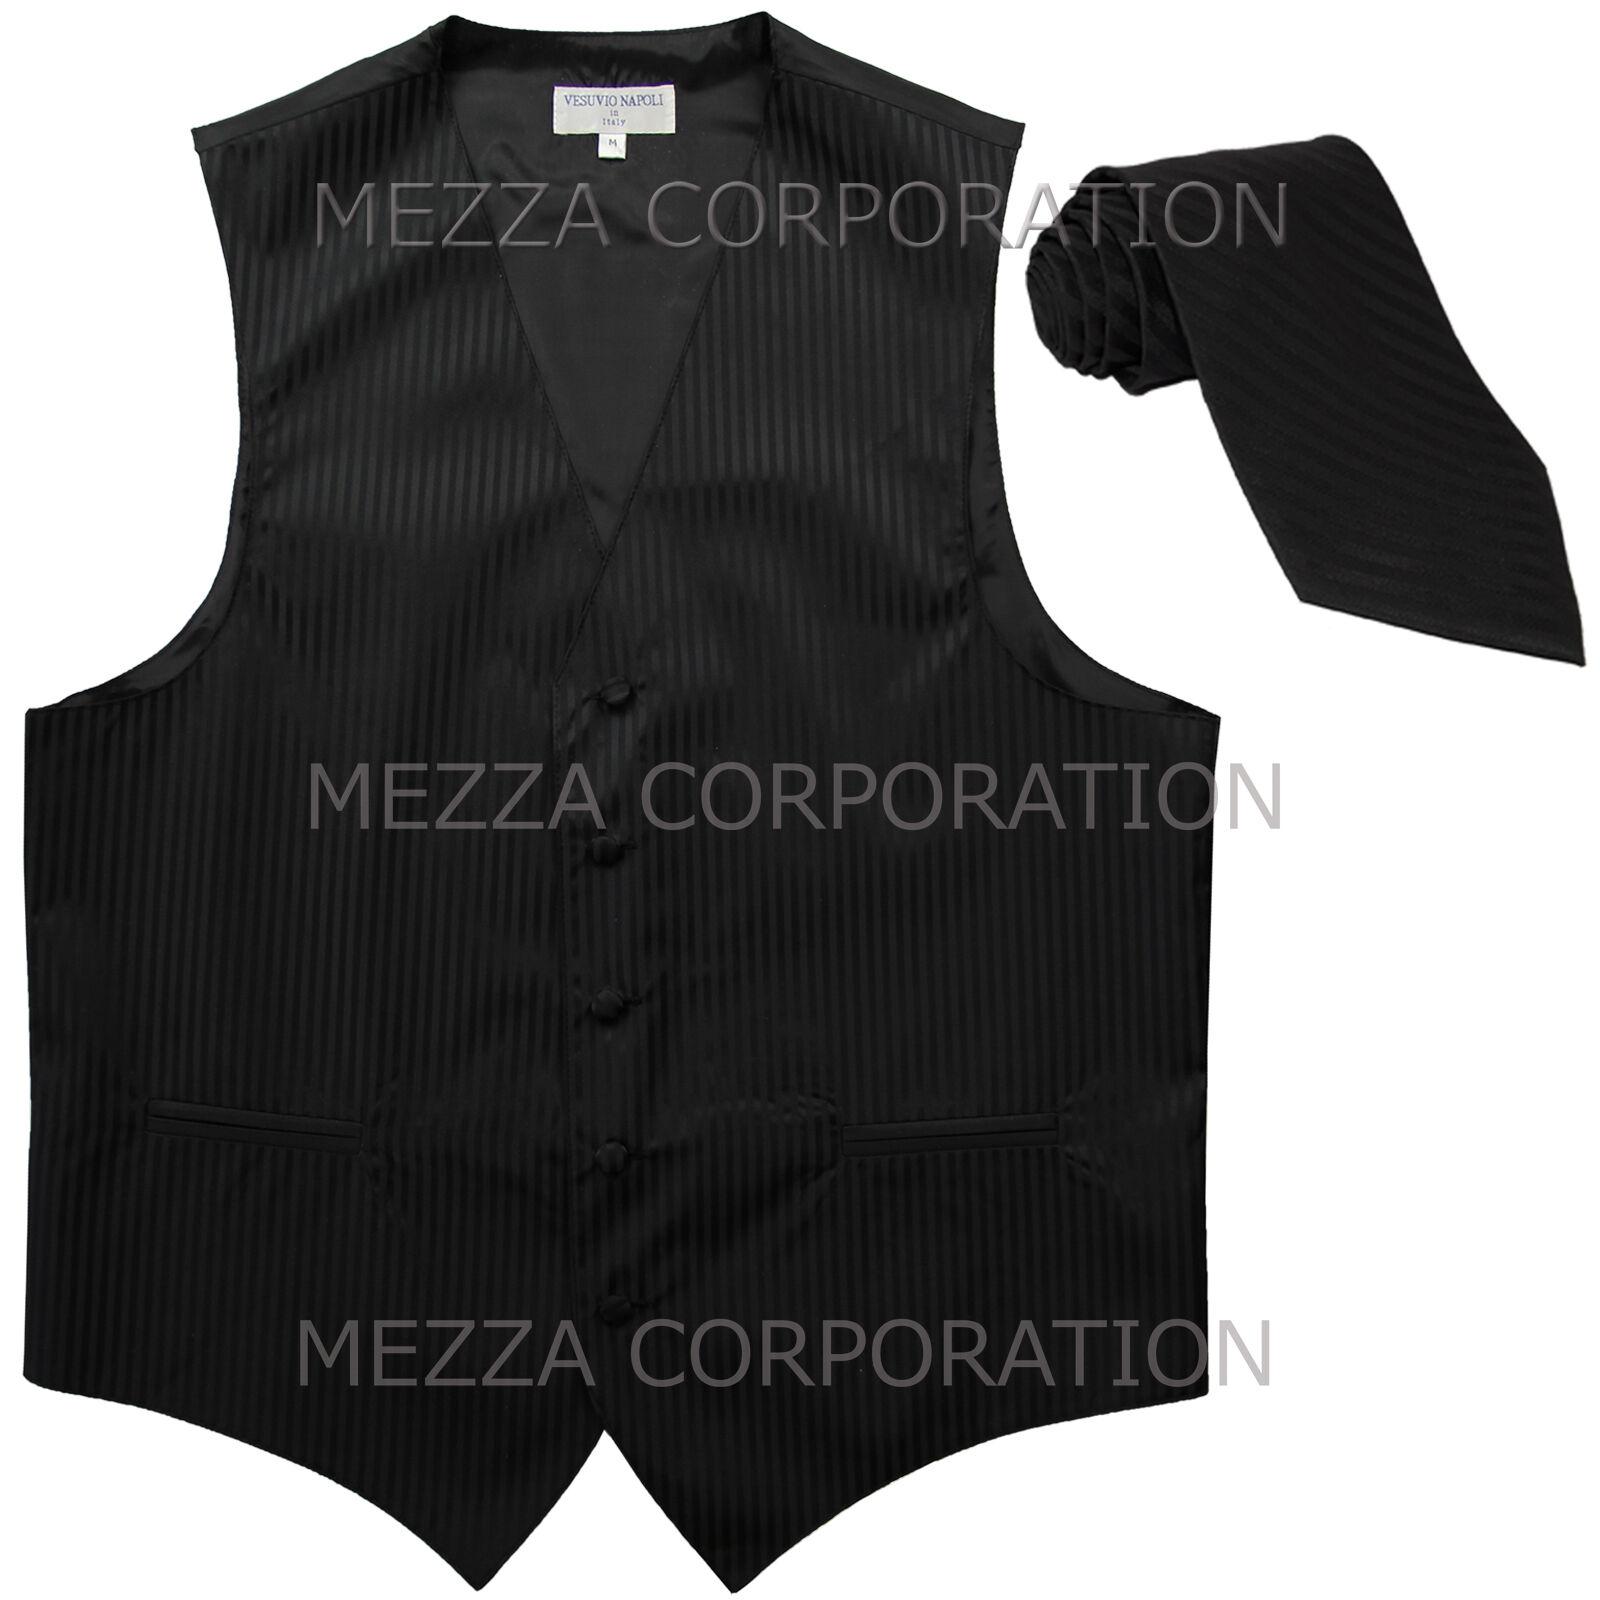 New Men's Tuxedo Vest Waistcoat Vertical Stripes Necktie prom party Black